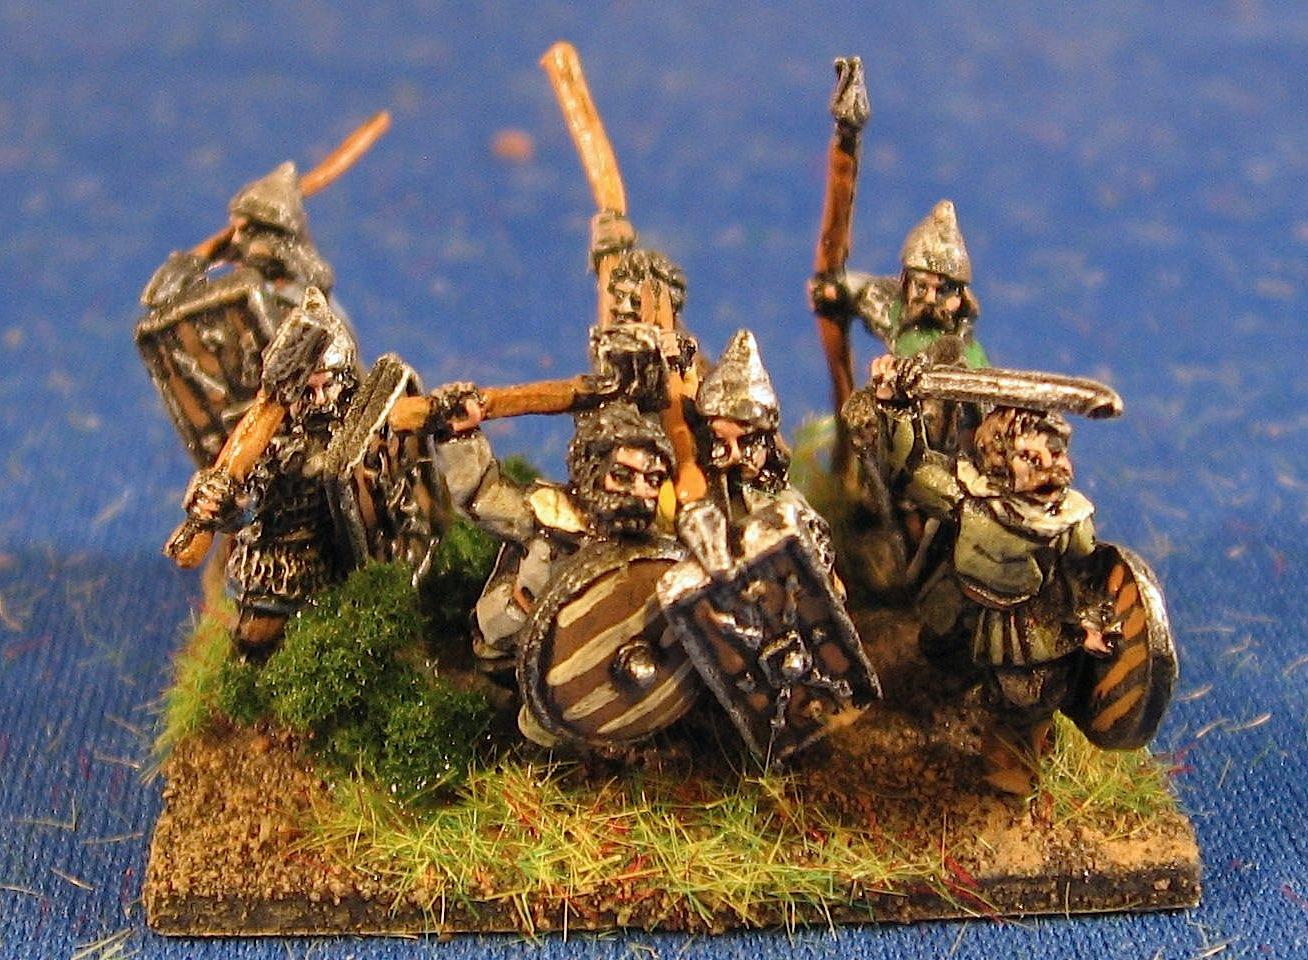 bob u0026 39 s miniature wargaming blog  15mm rus and early rus armies